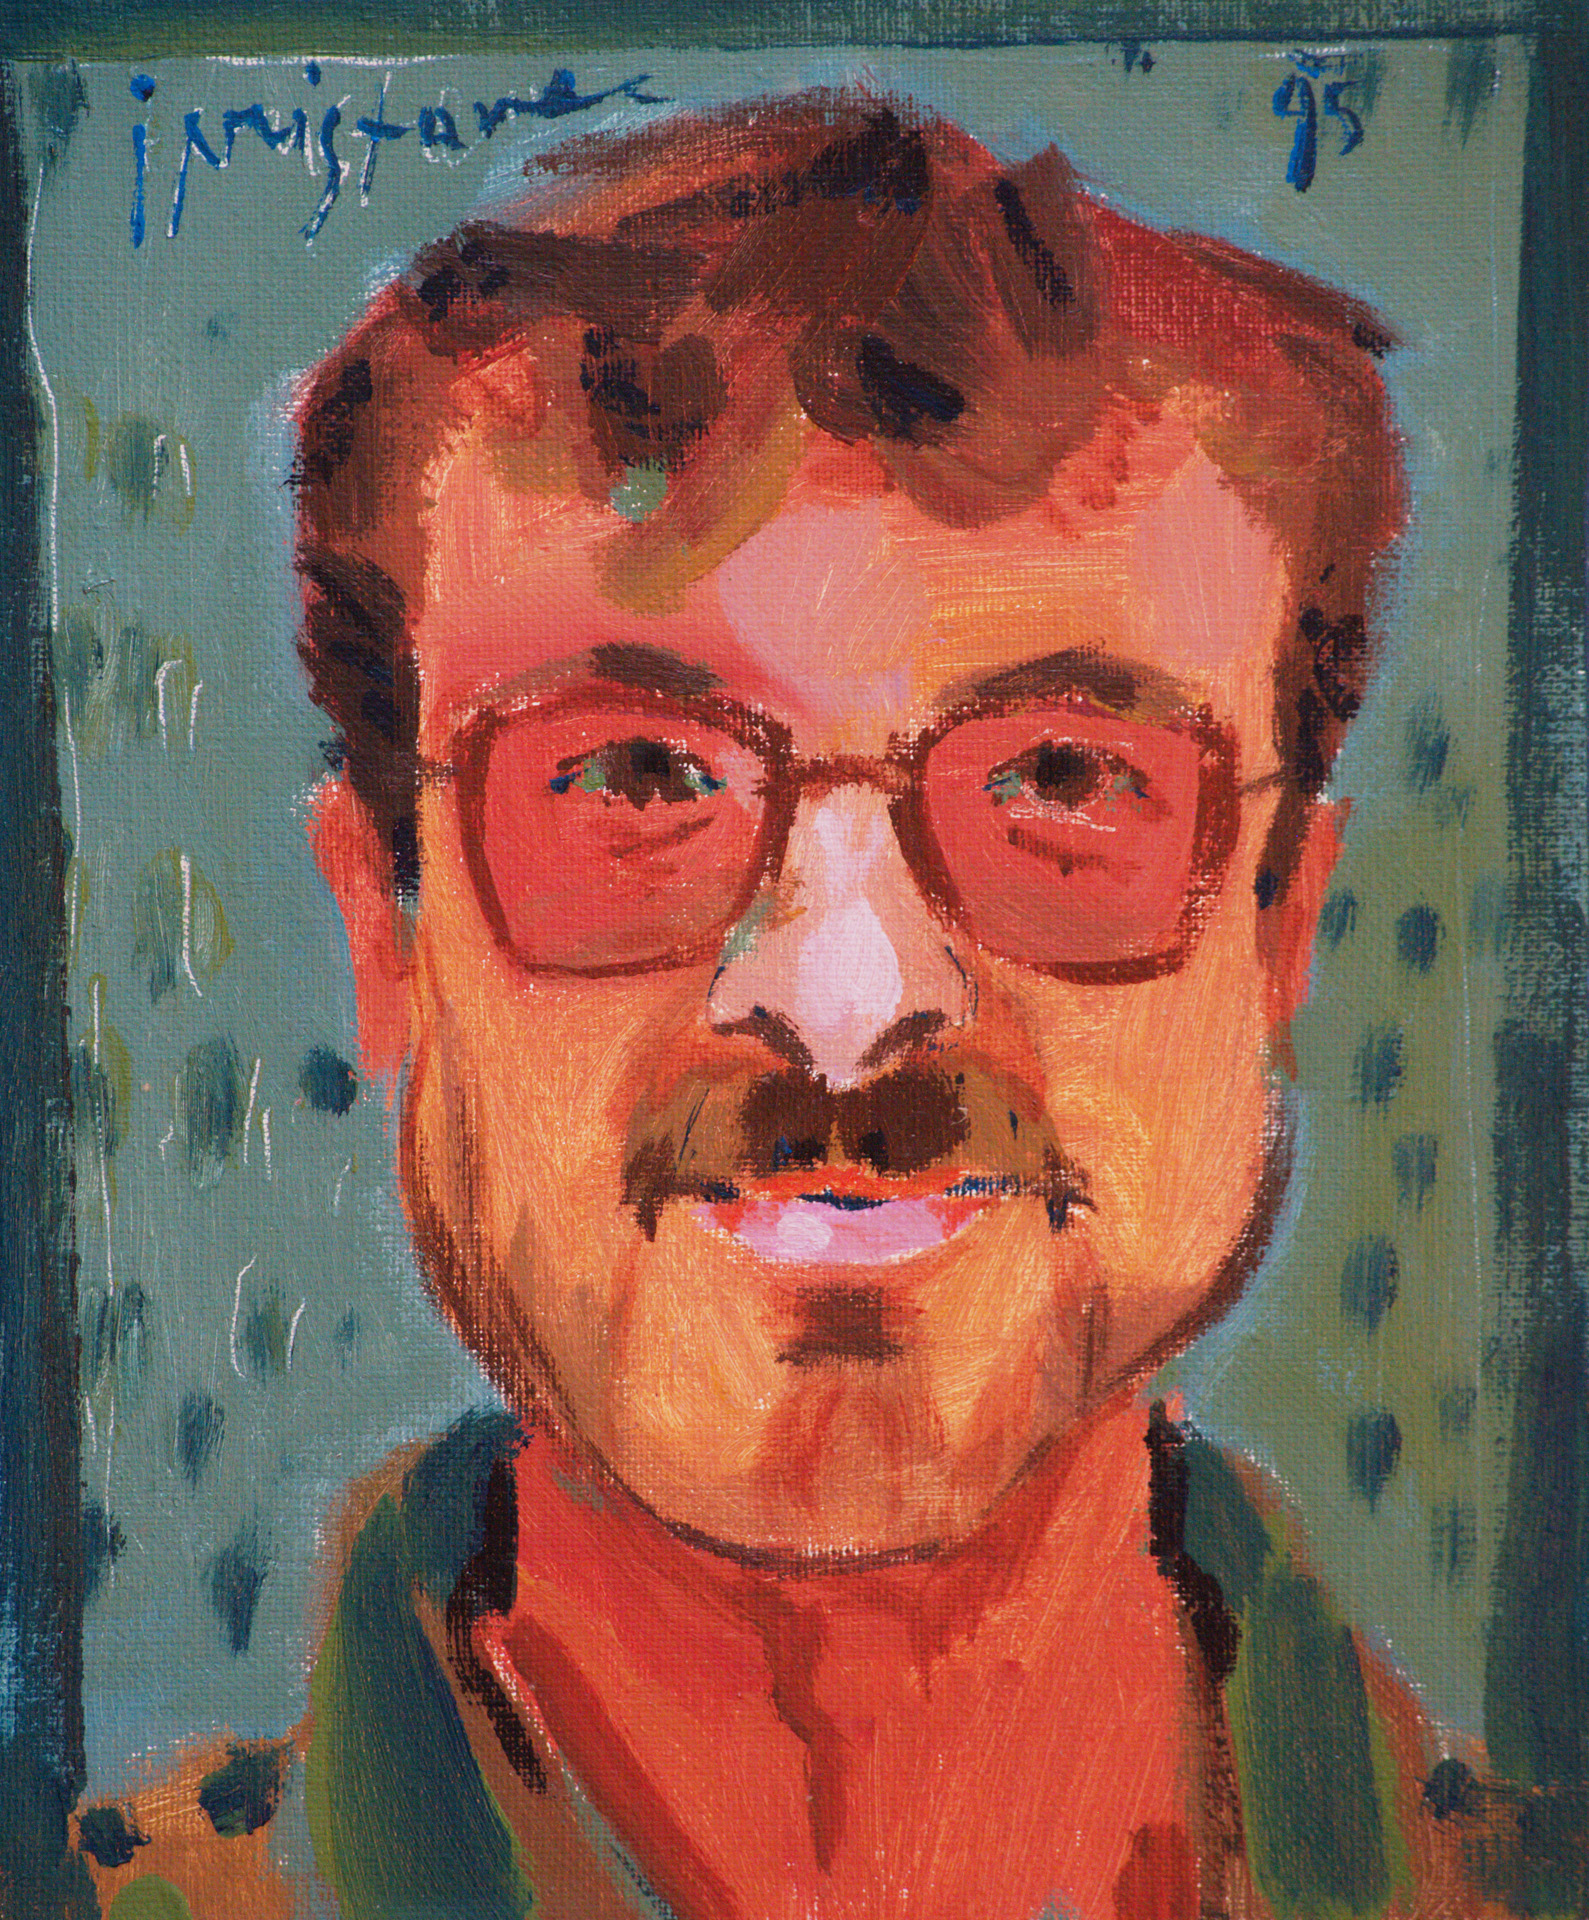 1995_portrait_25x30cm_Portrait_of_Mladen_Orbanic.jpg